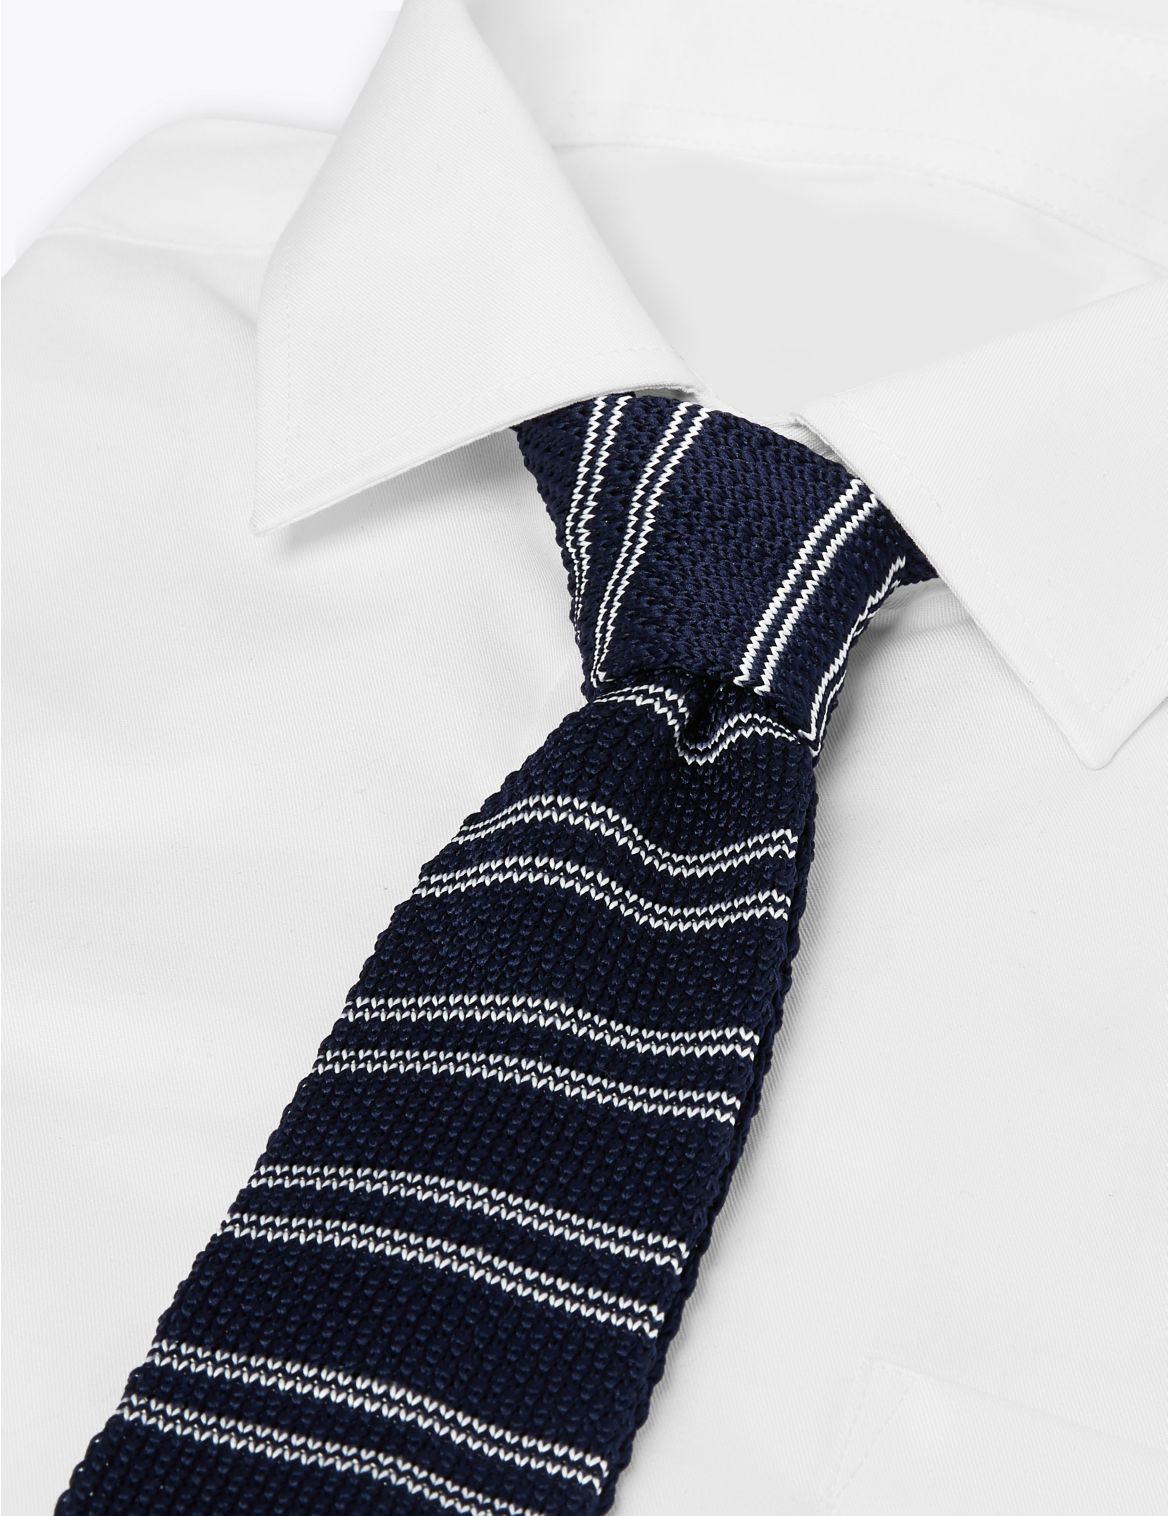 Cravate fine en maille Ă bout carrĂŠ et rayures